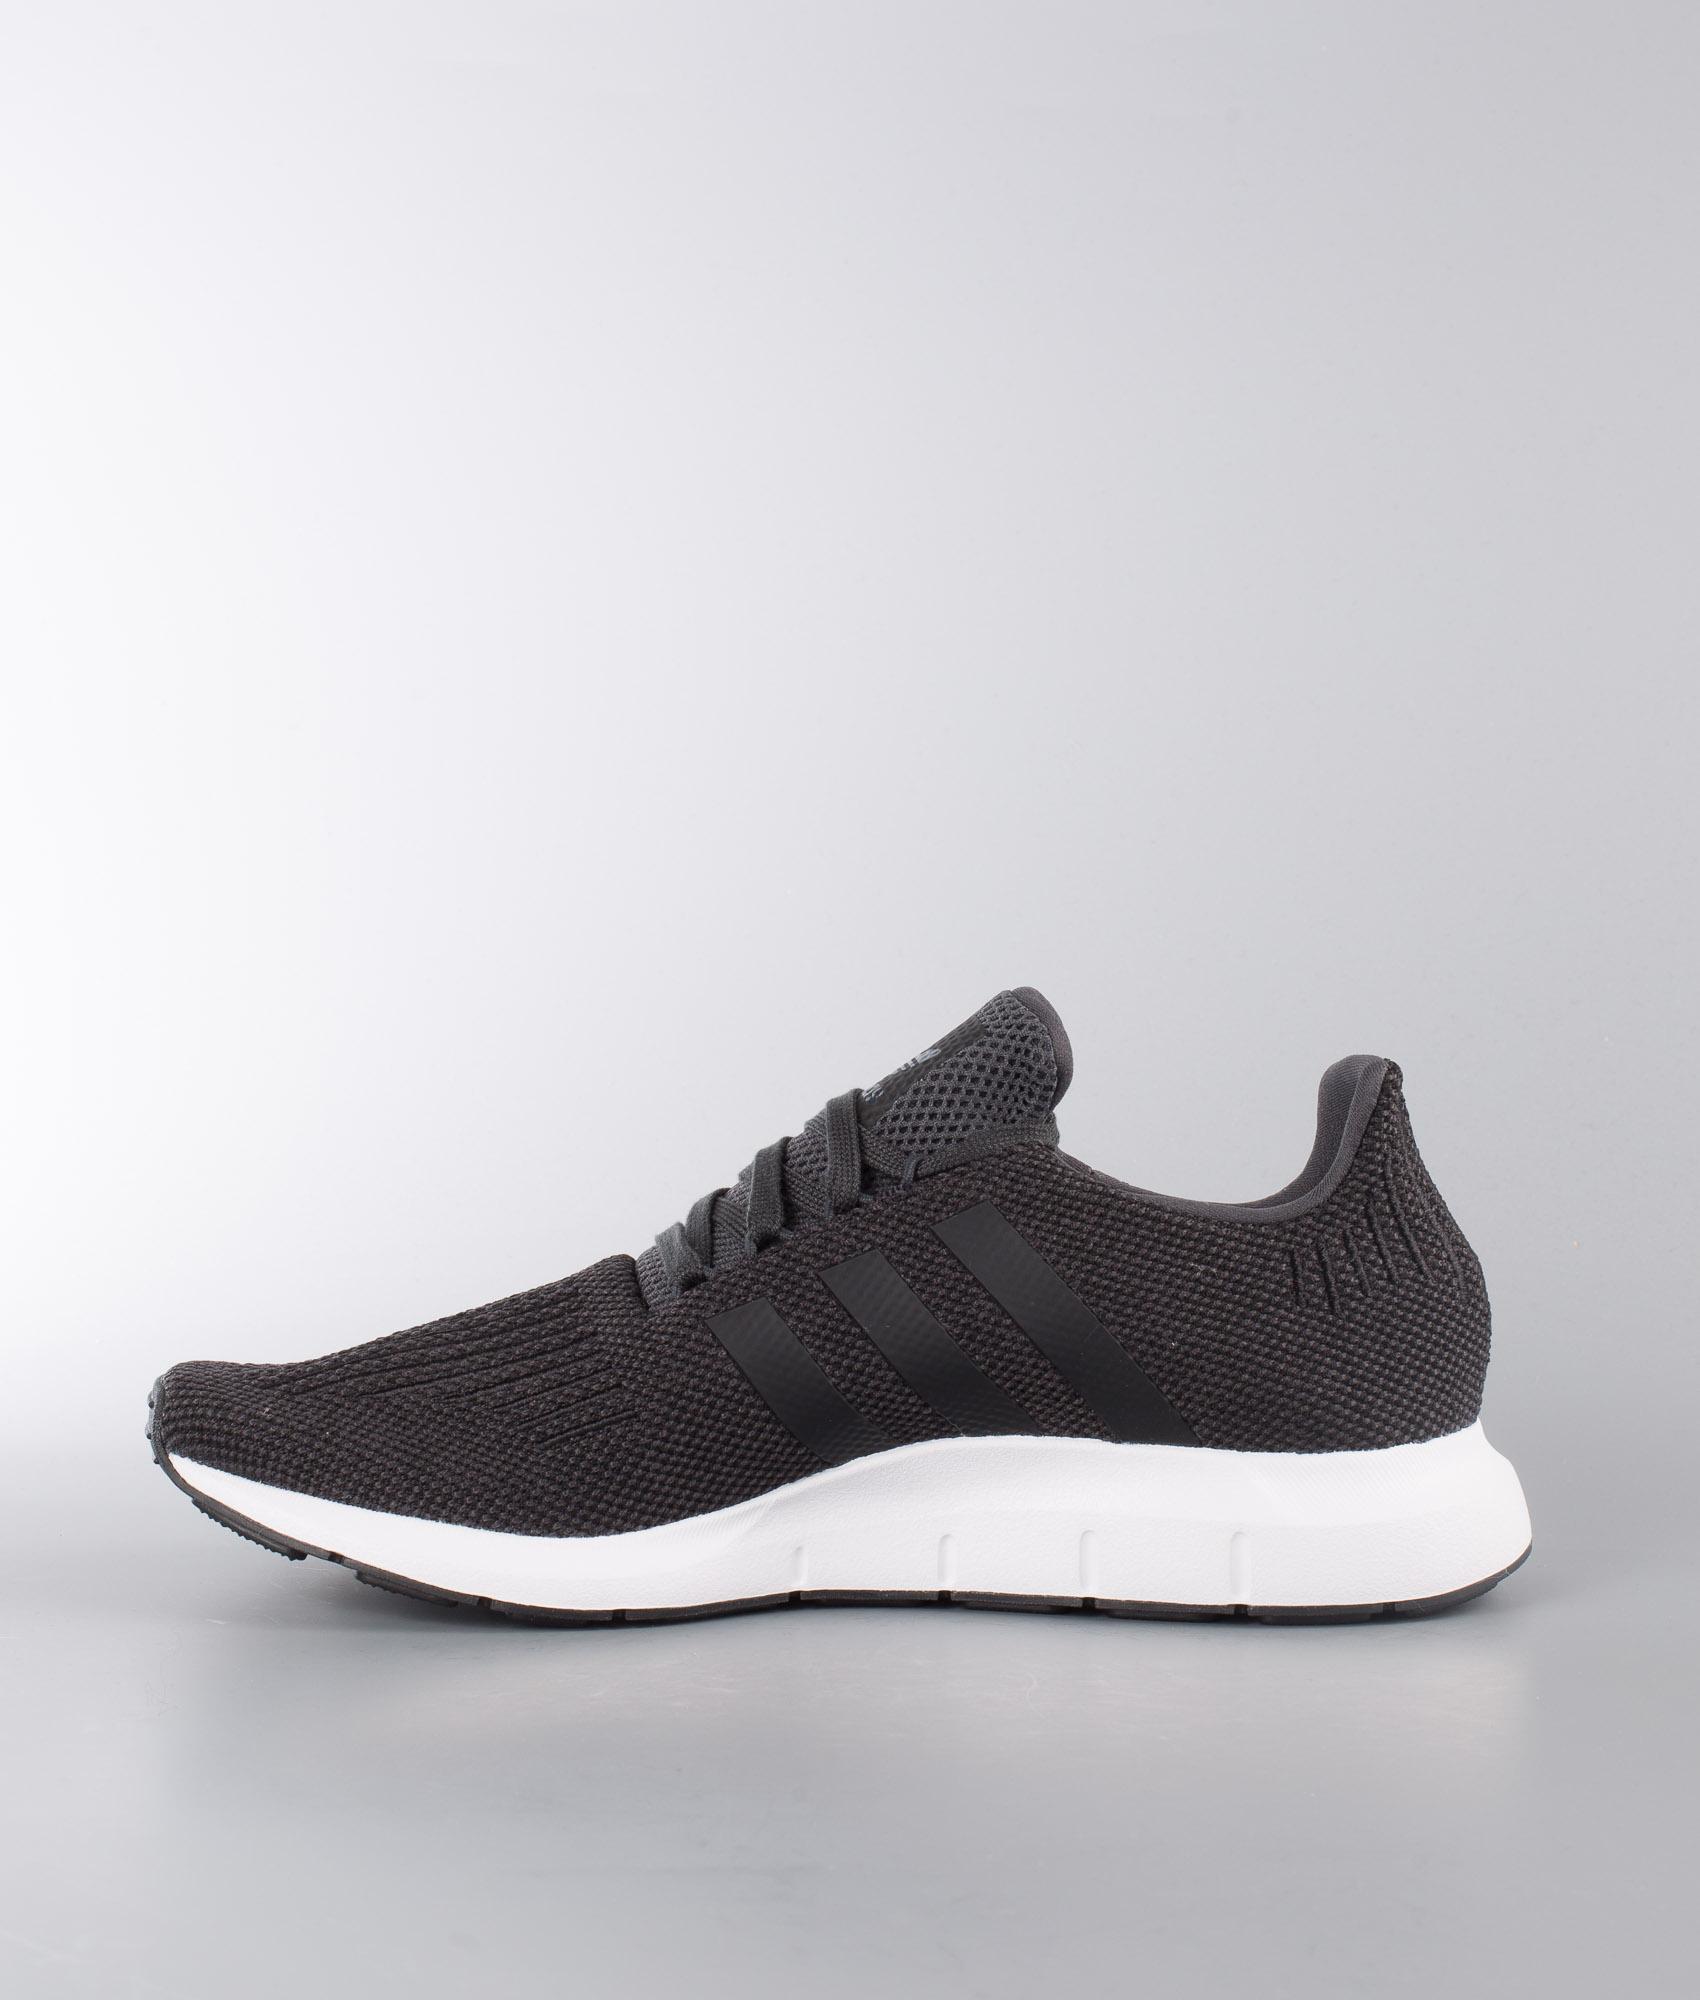 Run Schuhe Blackmedium Grey Swift Originals Carboncore Heather Adidas Ybv6f7gy